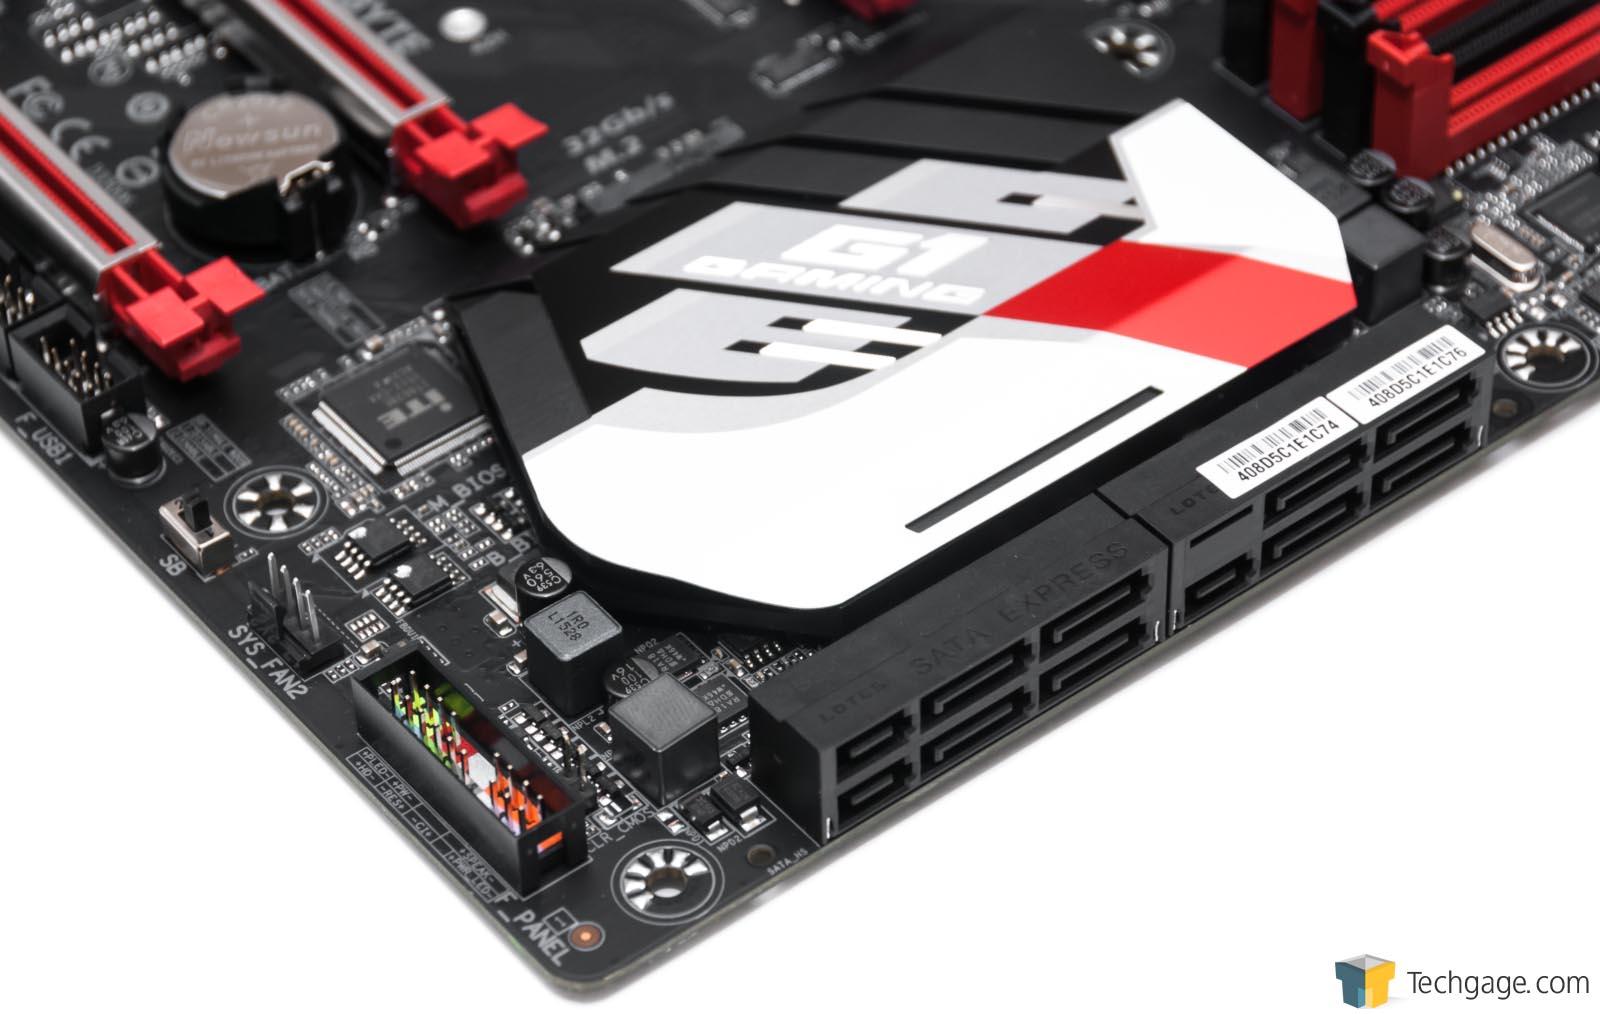 7 Pin Sata Connectors On Motherboard: GIGABYTE GA-Z170X-Gaming 7 Motherboard Review